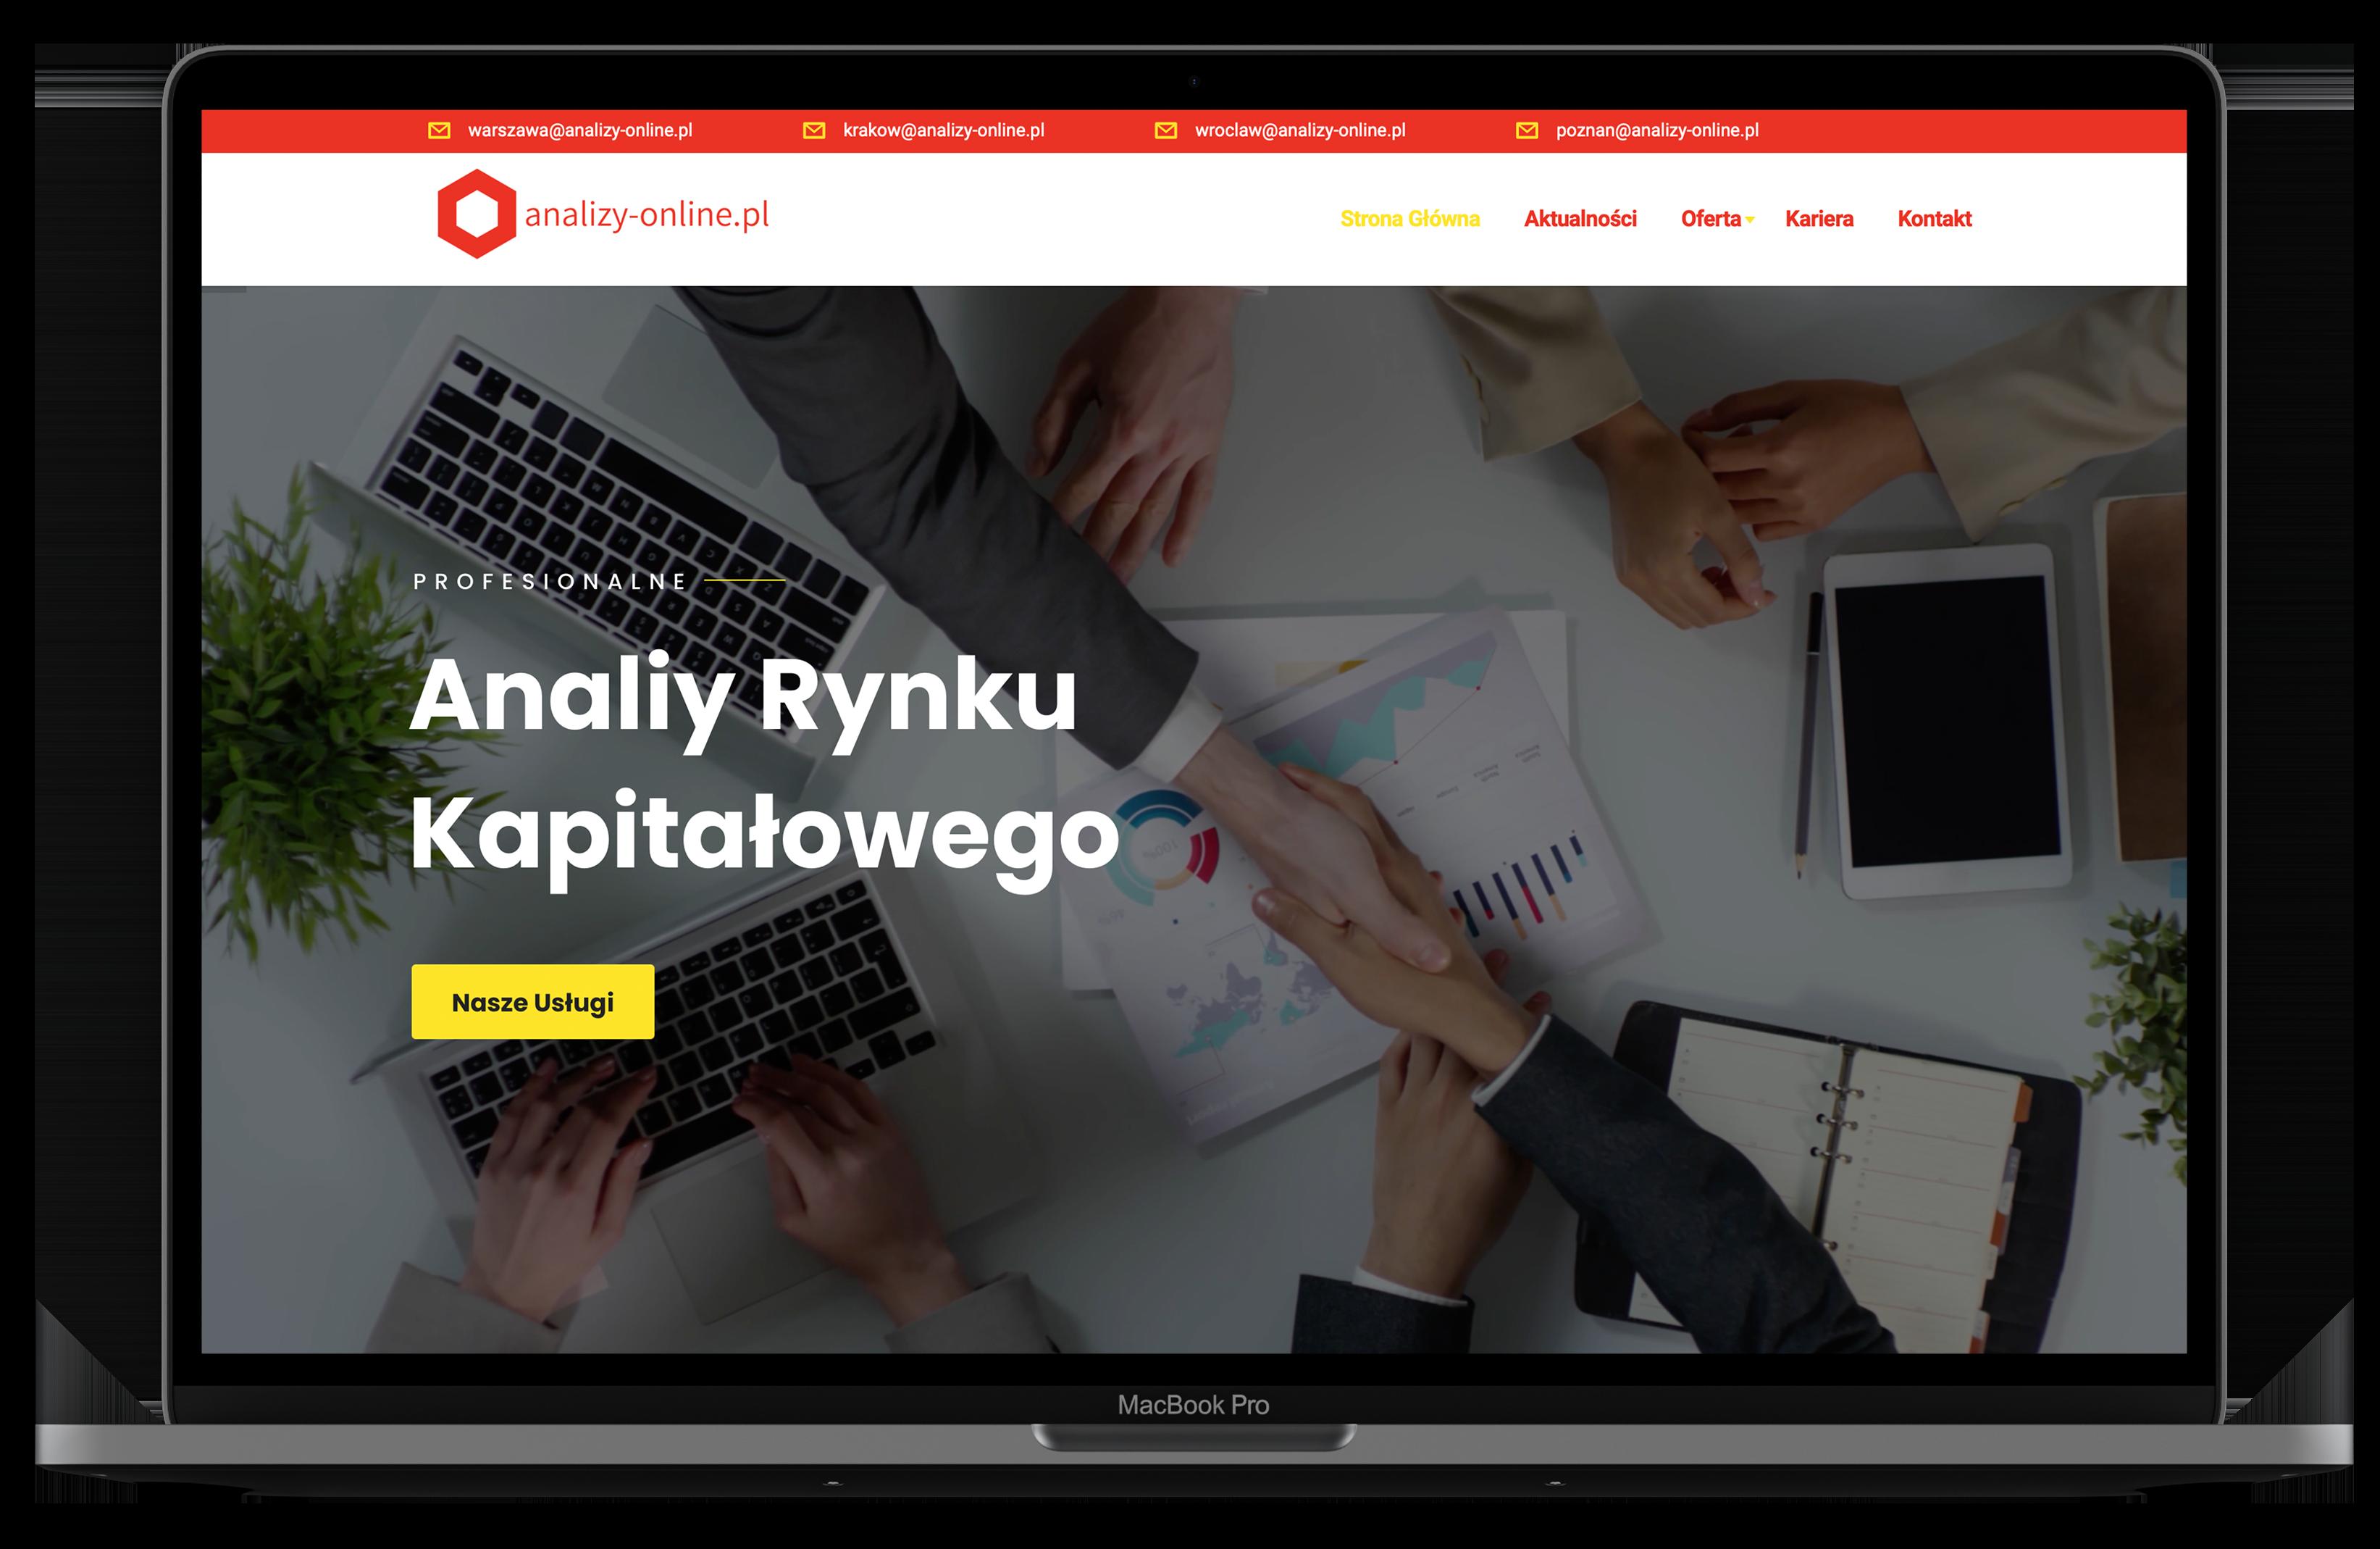 analizy-online